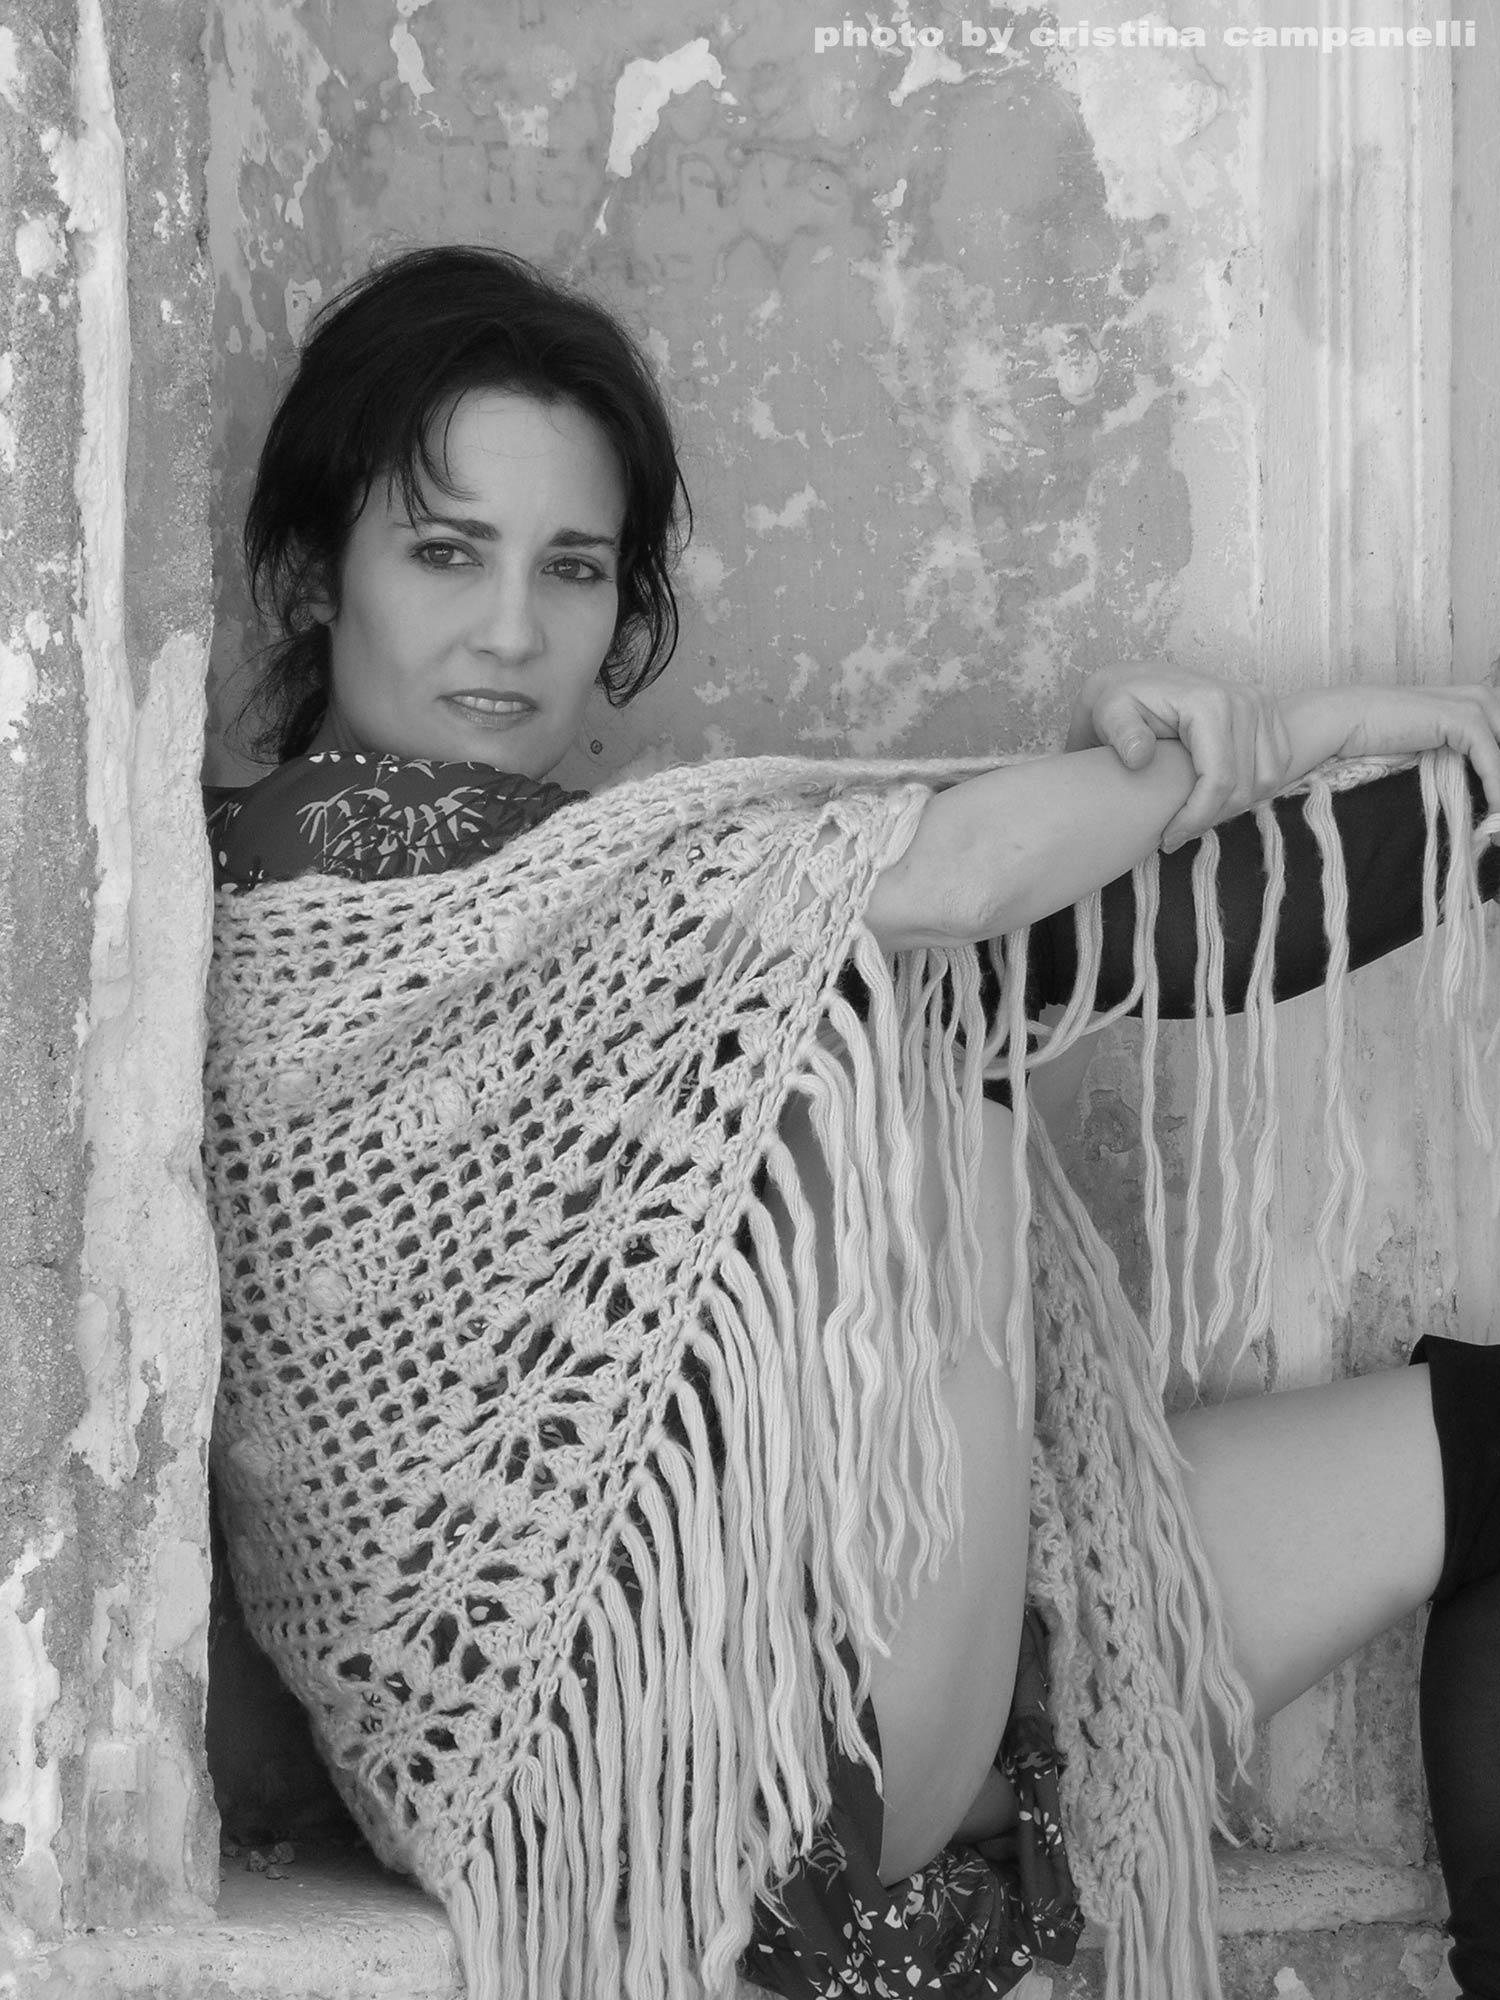 Coralina Cataldi-Tassoni photo by Cristina Campanelli (16).jpg